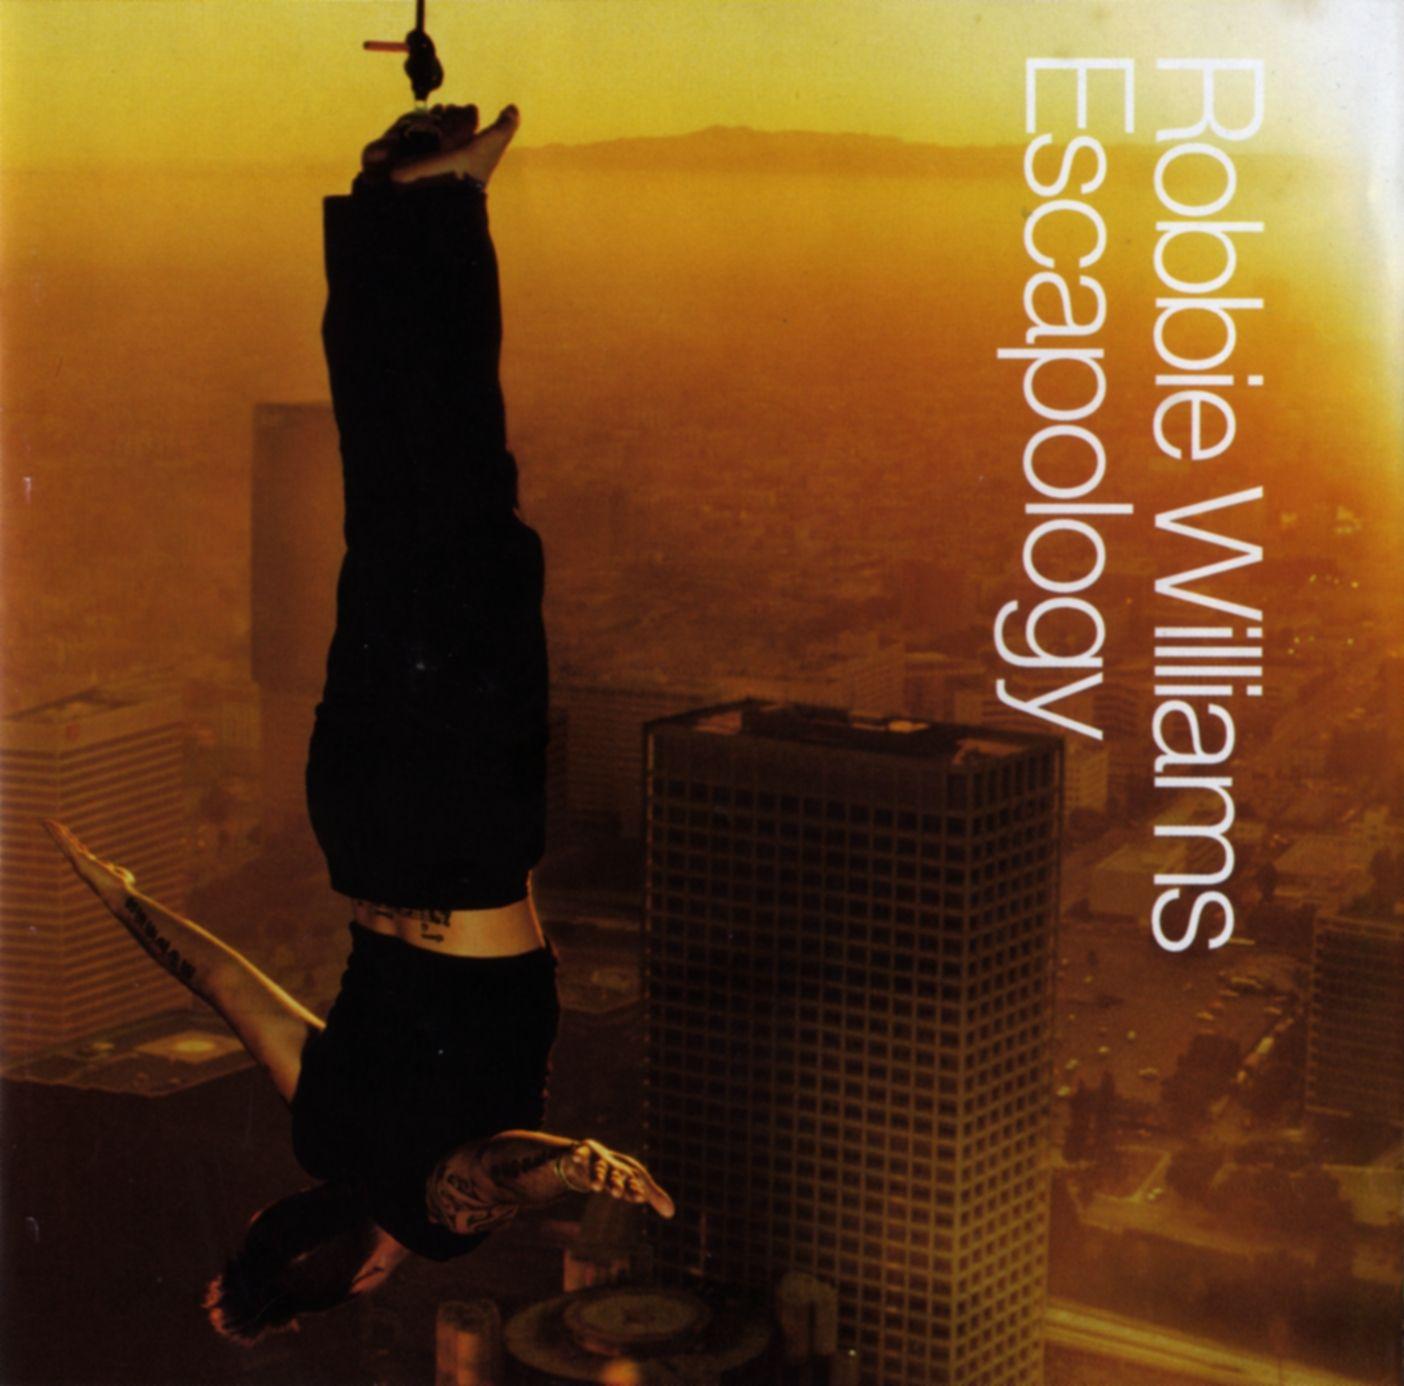 Robbie Williams - Escapology album cover